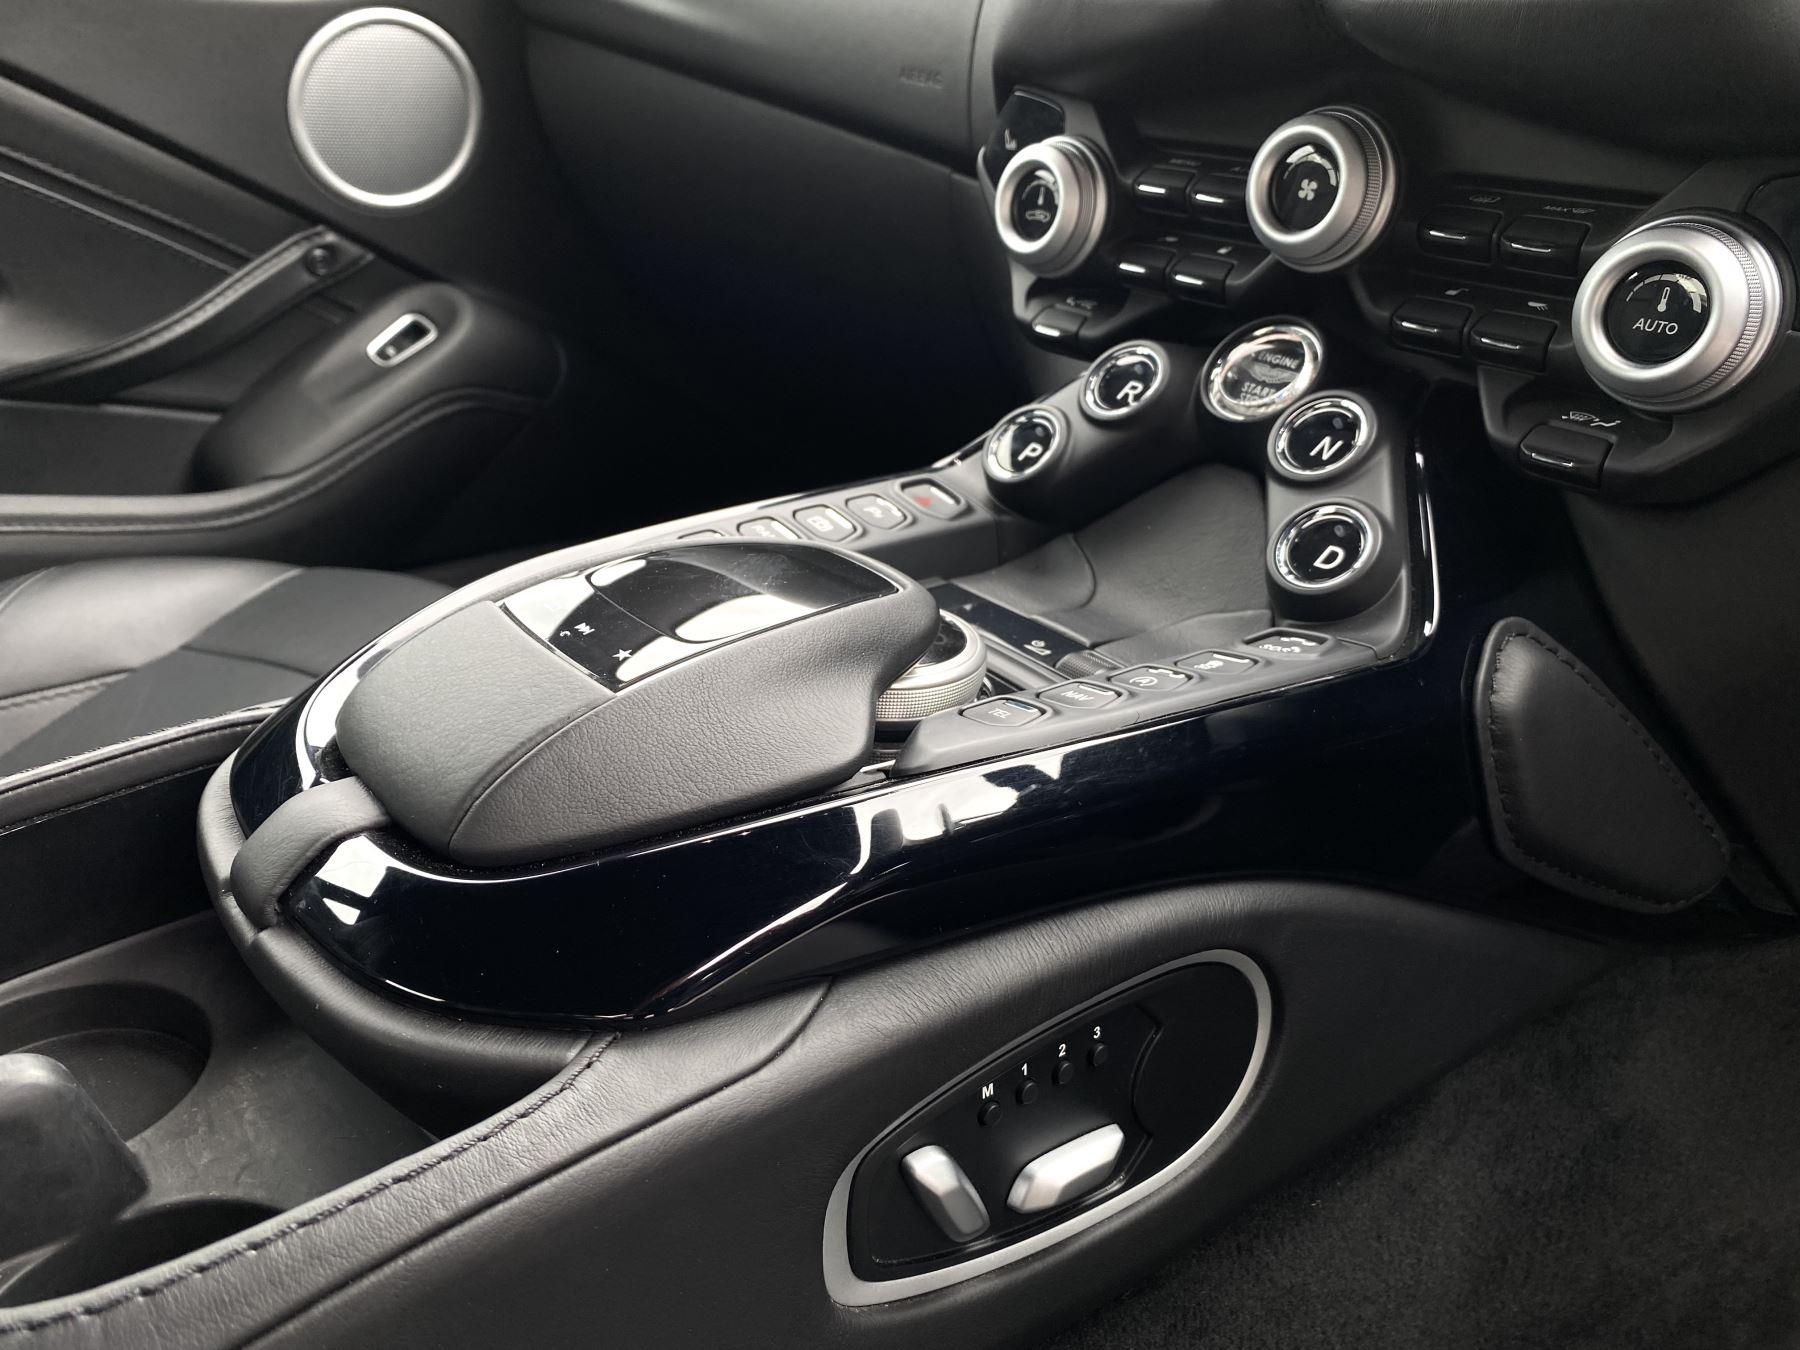 Aston Martin New Vantage 2dr ZF 8 Speed Auto. 4.0 Twin Turbo ZF Gearbox  Reversing Camera Heated Seats Ceramic Brakes image 33